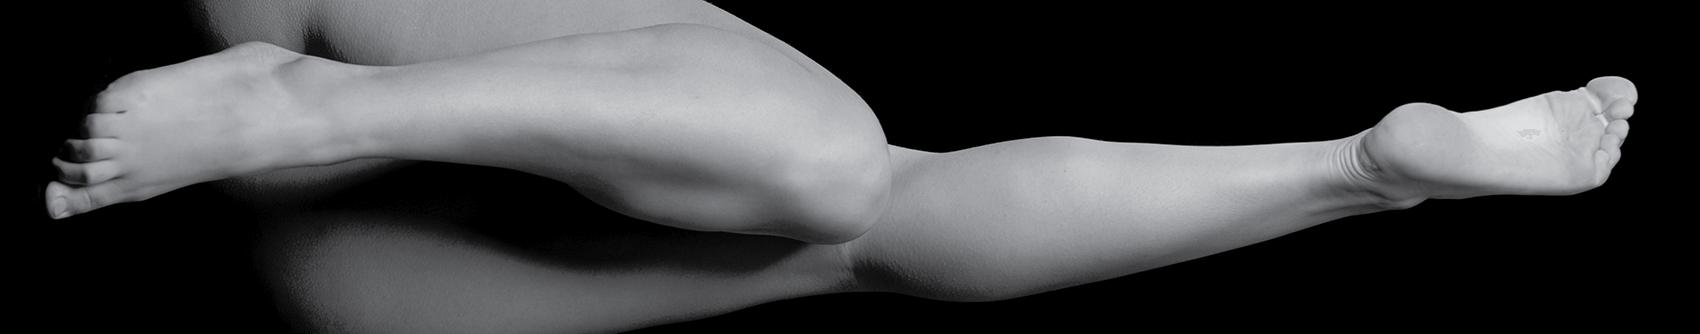 feet & legs